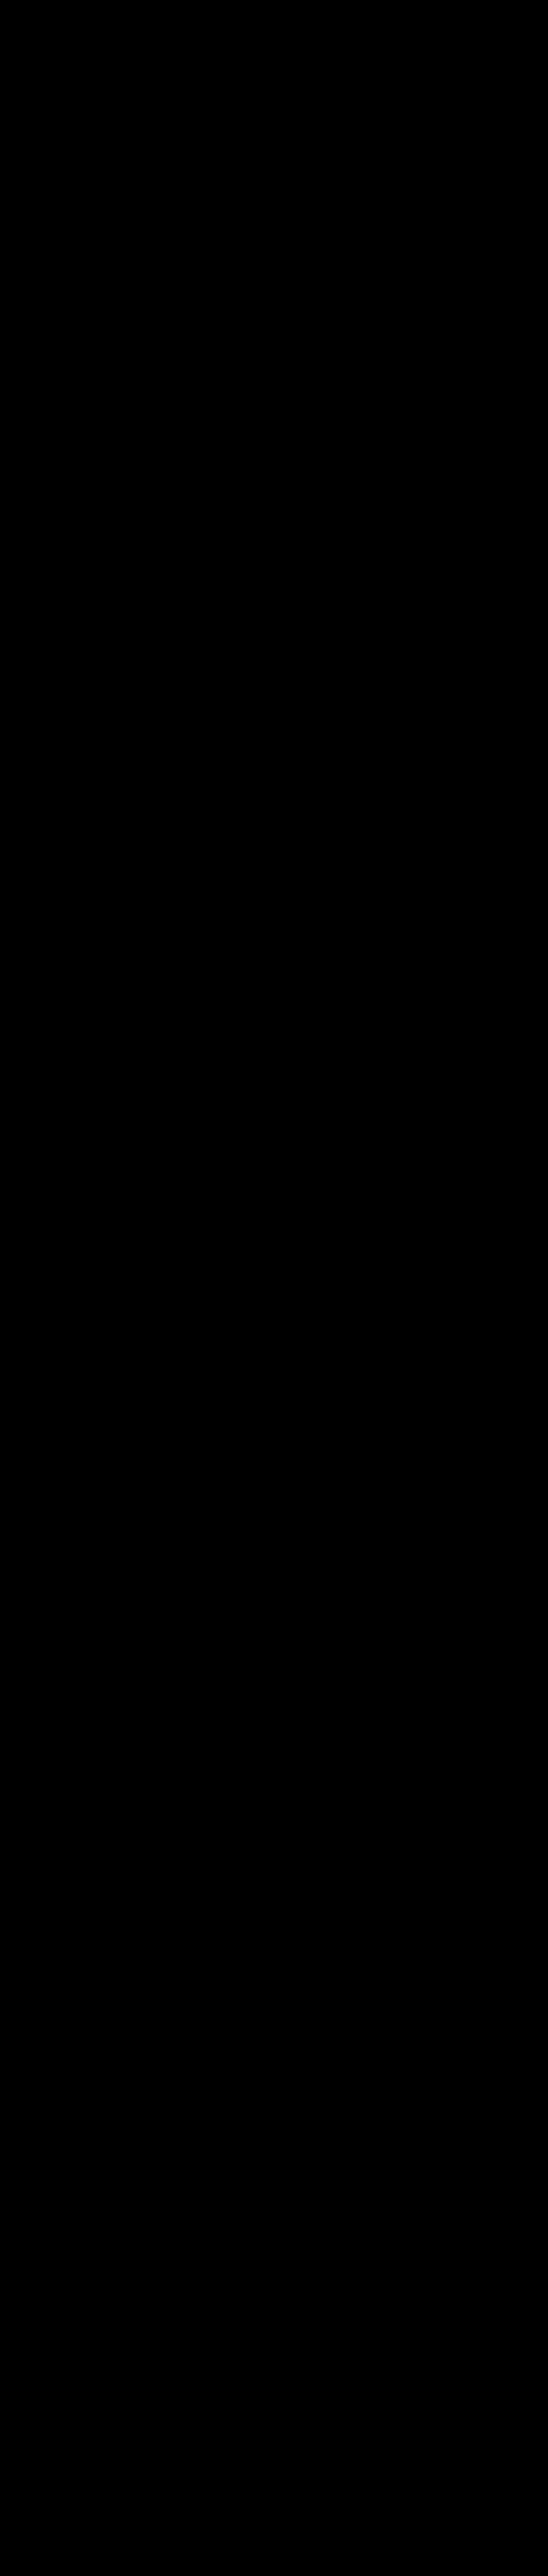 Image-Shr-birch